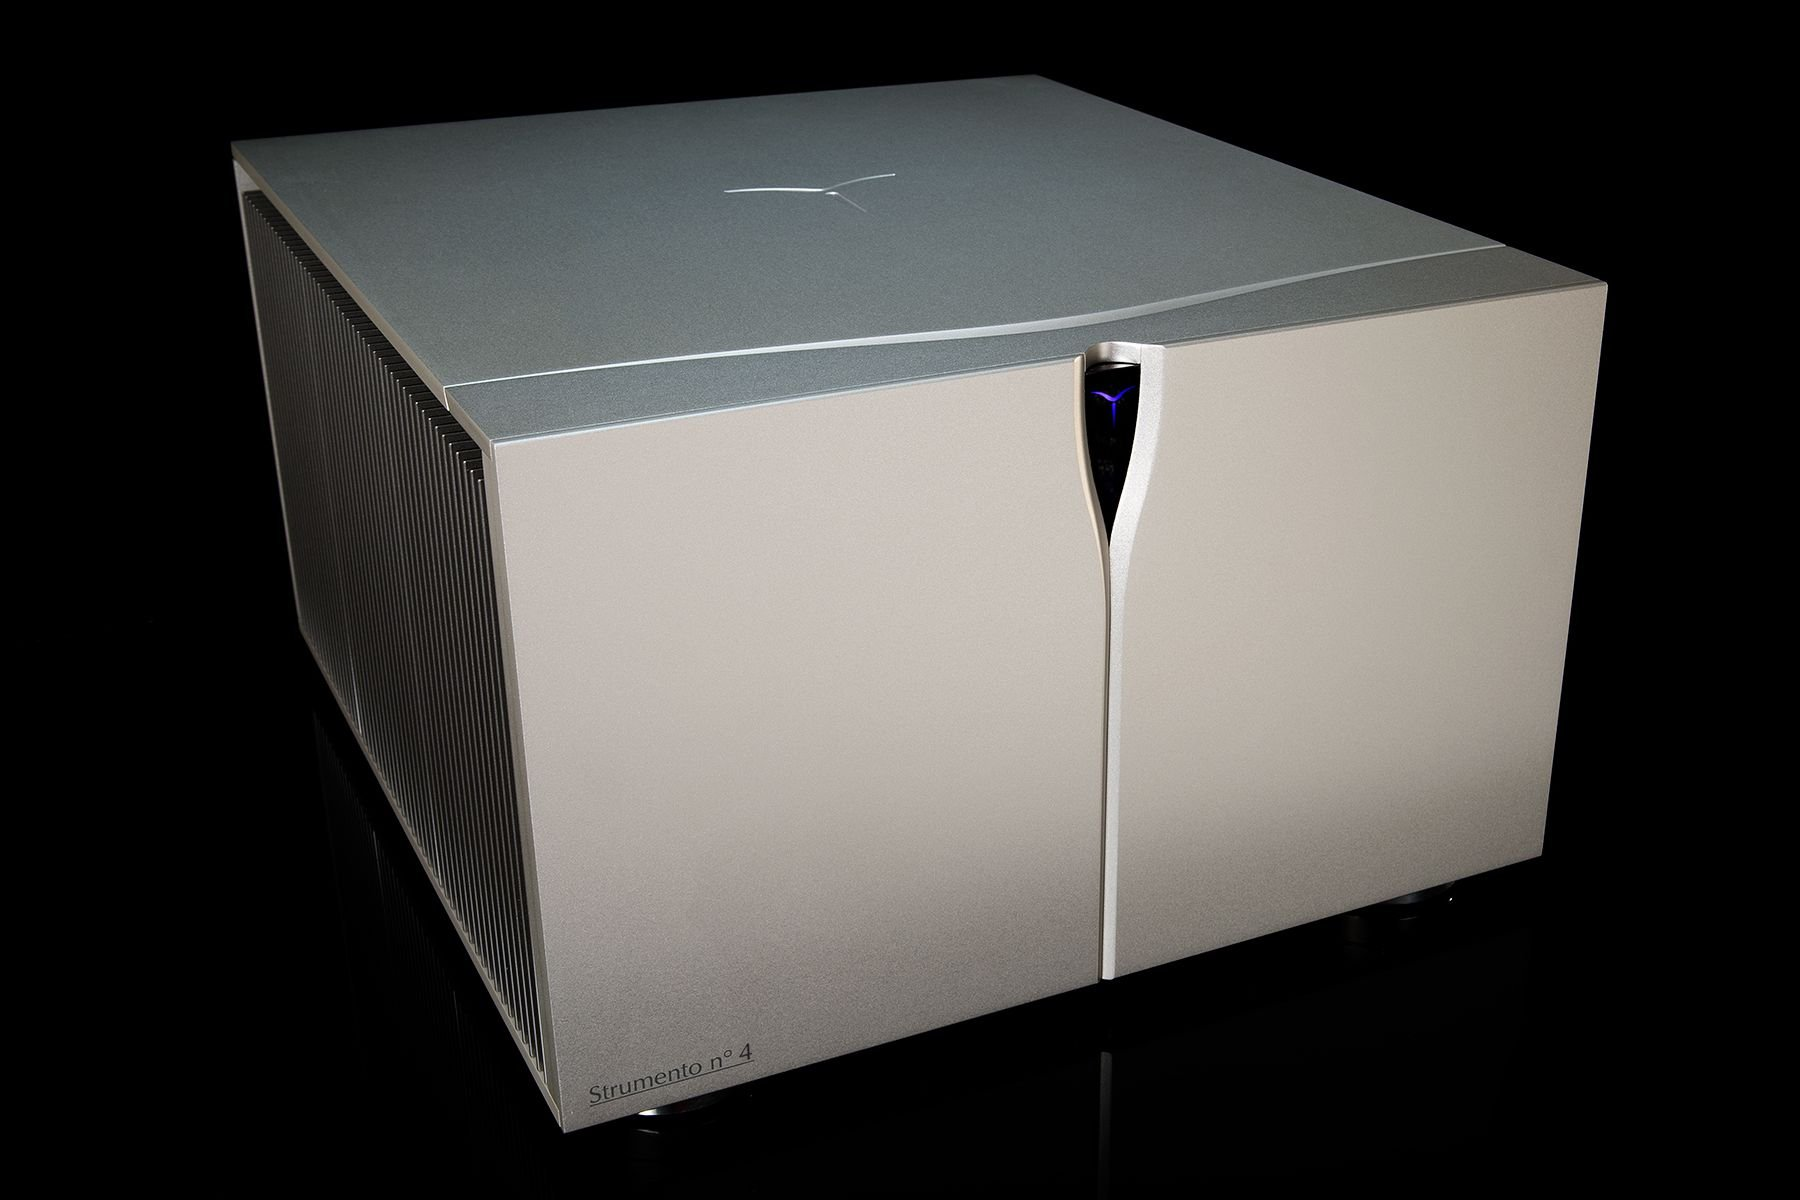 Audia Flight Strumentzo No. 4 Mk2 Stereo Endstufe